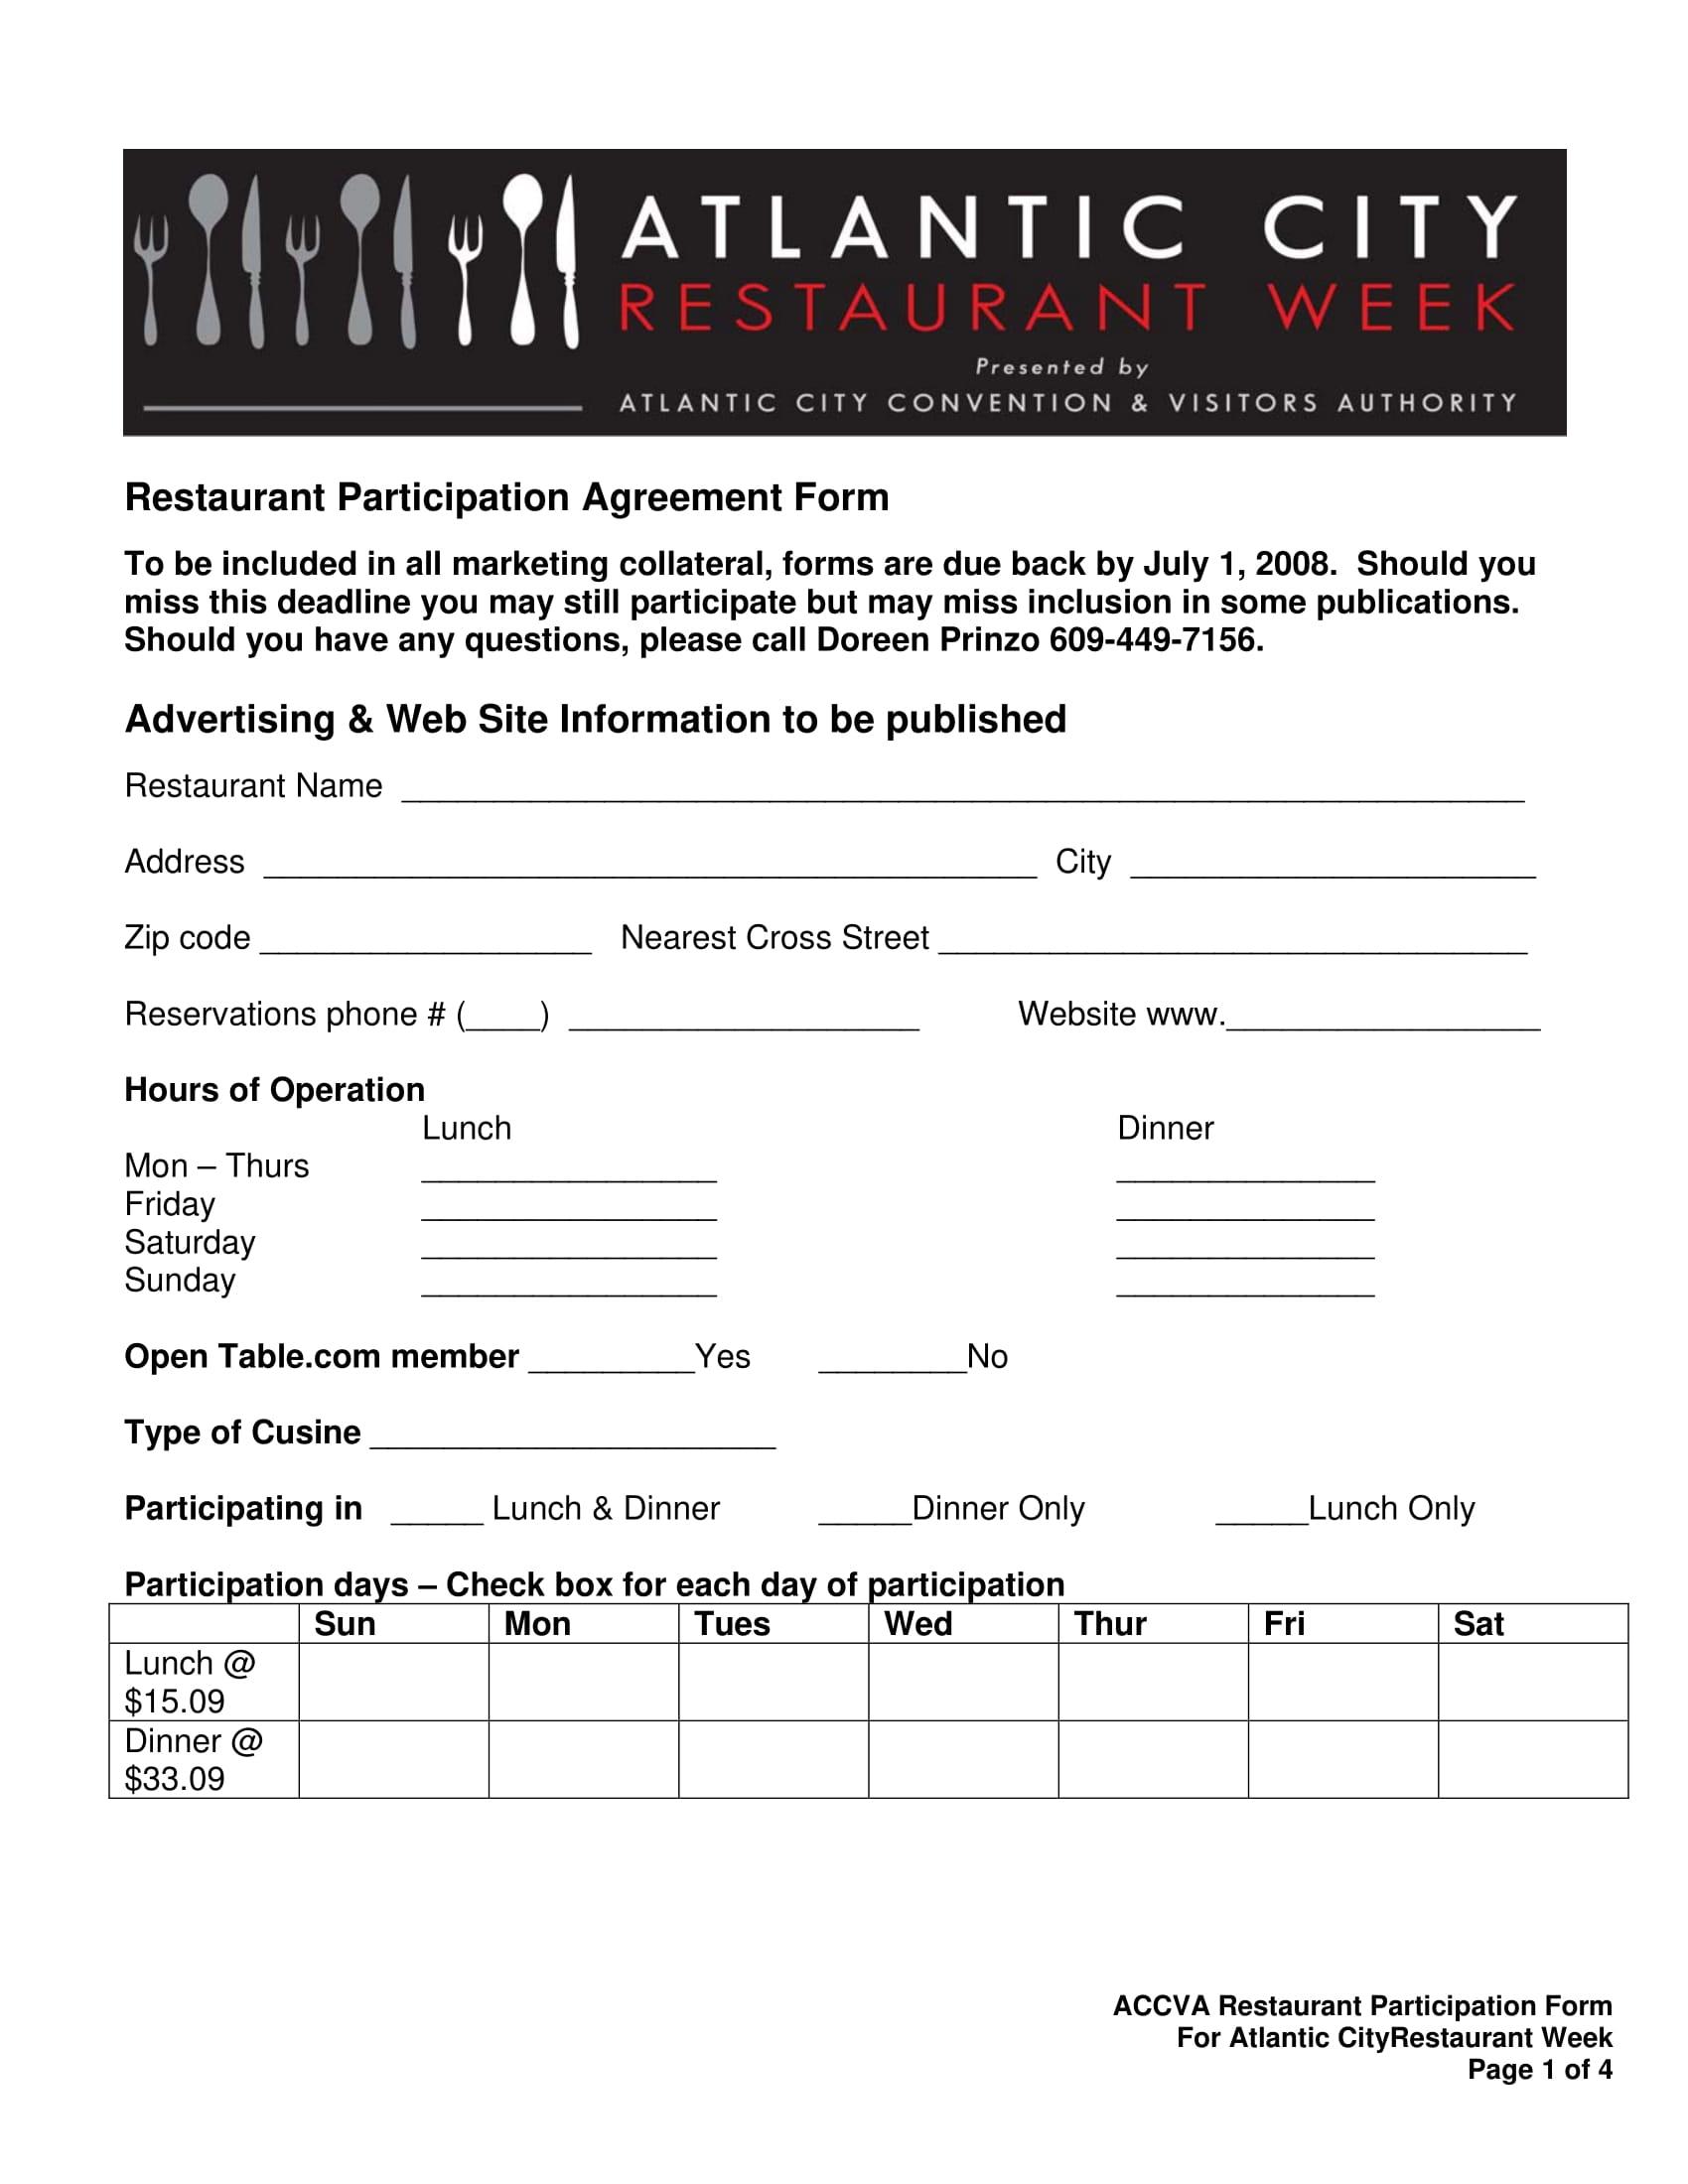 restaurant participation agreement form 1